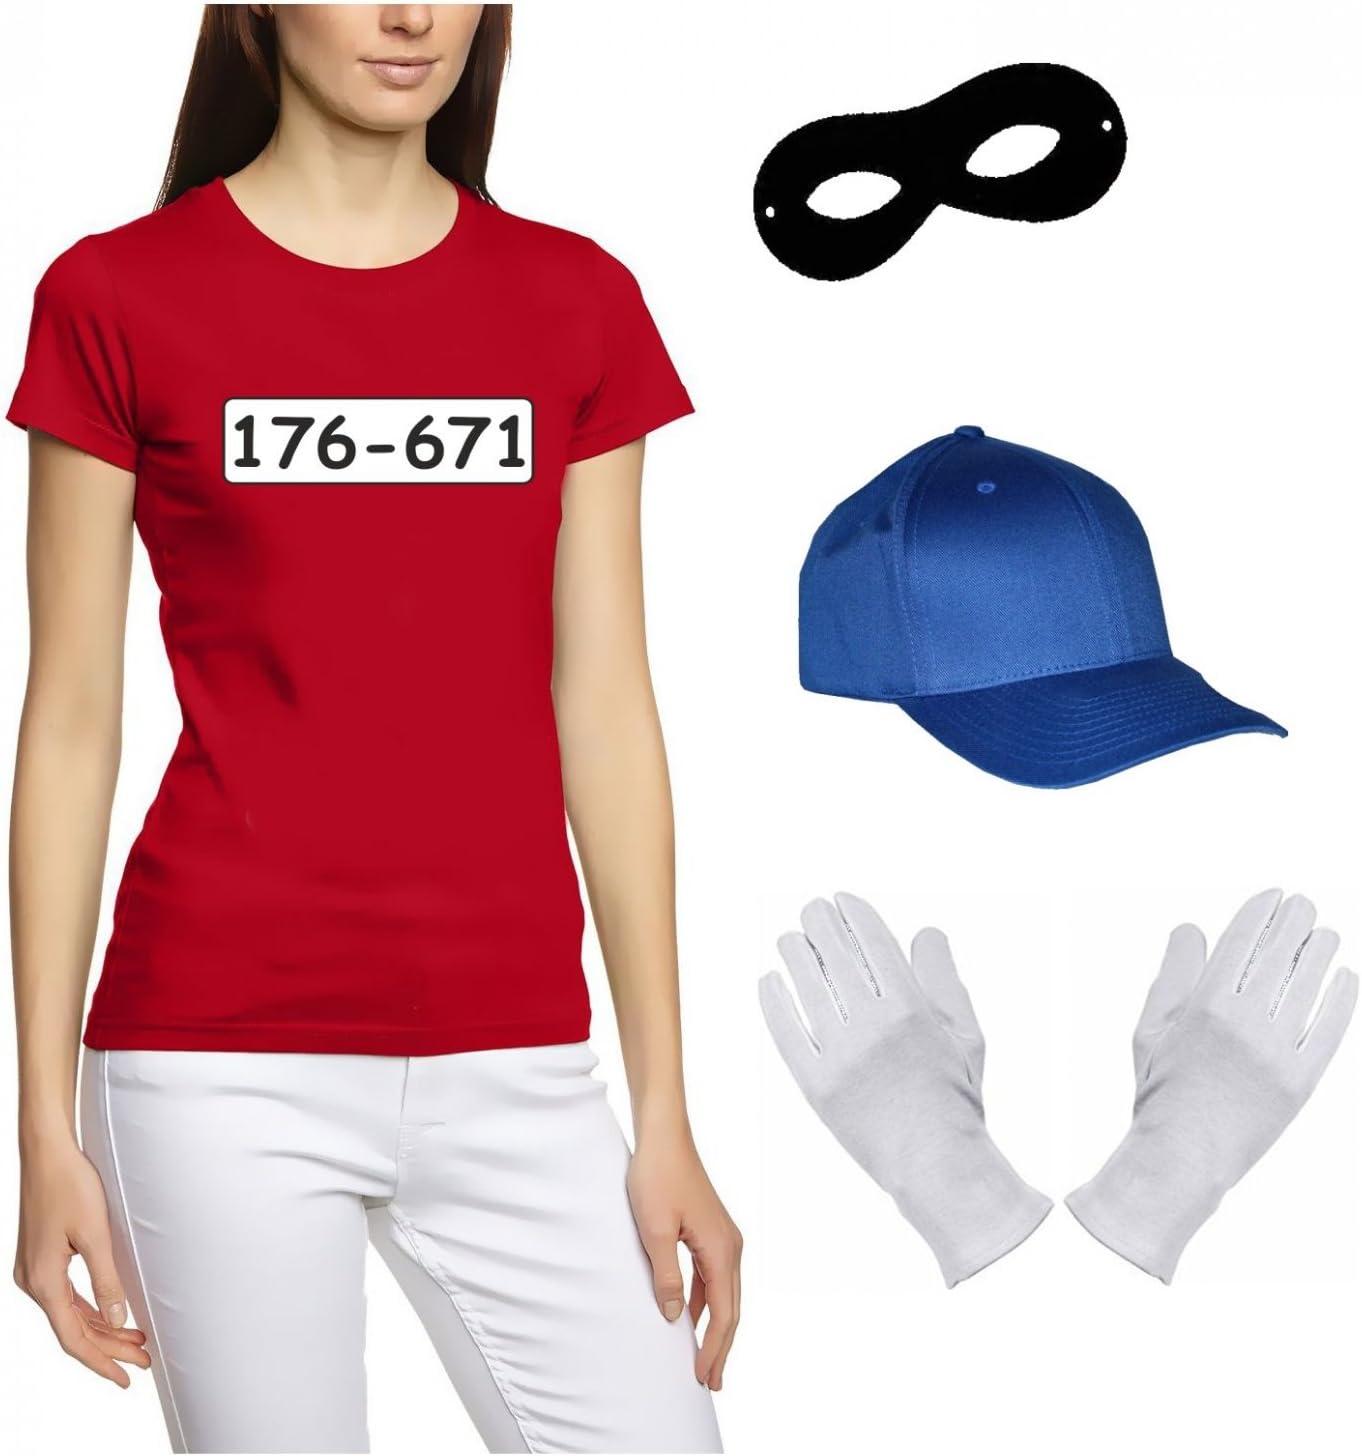 Coole-Fun-T-Shirts - Conjunto de disfraz de grupo de gánsters para ...